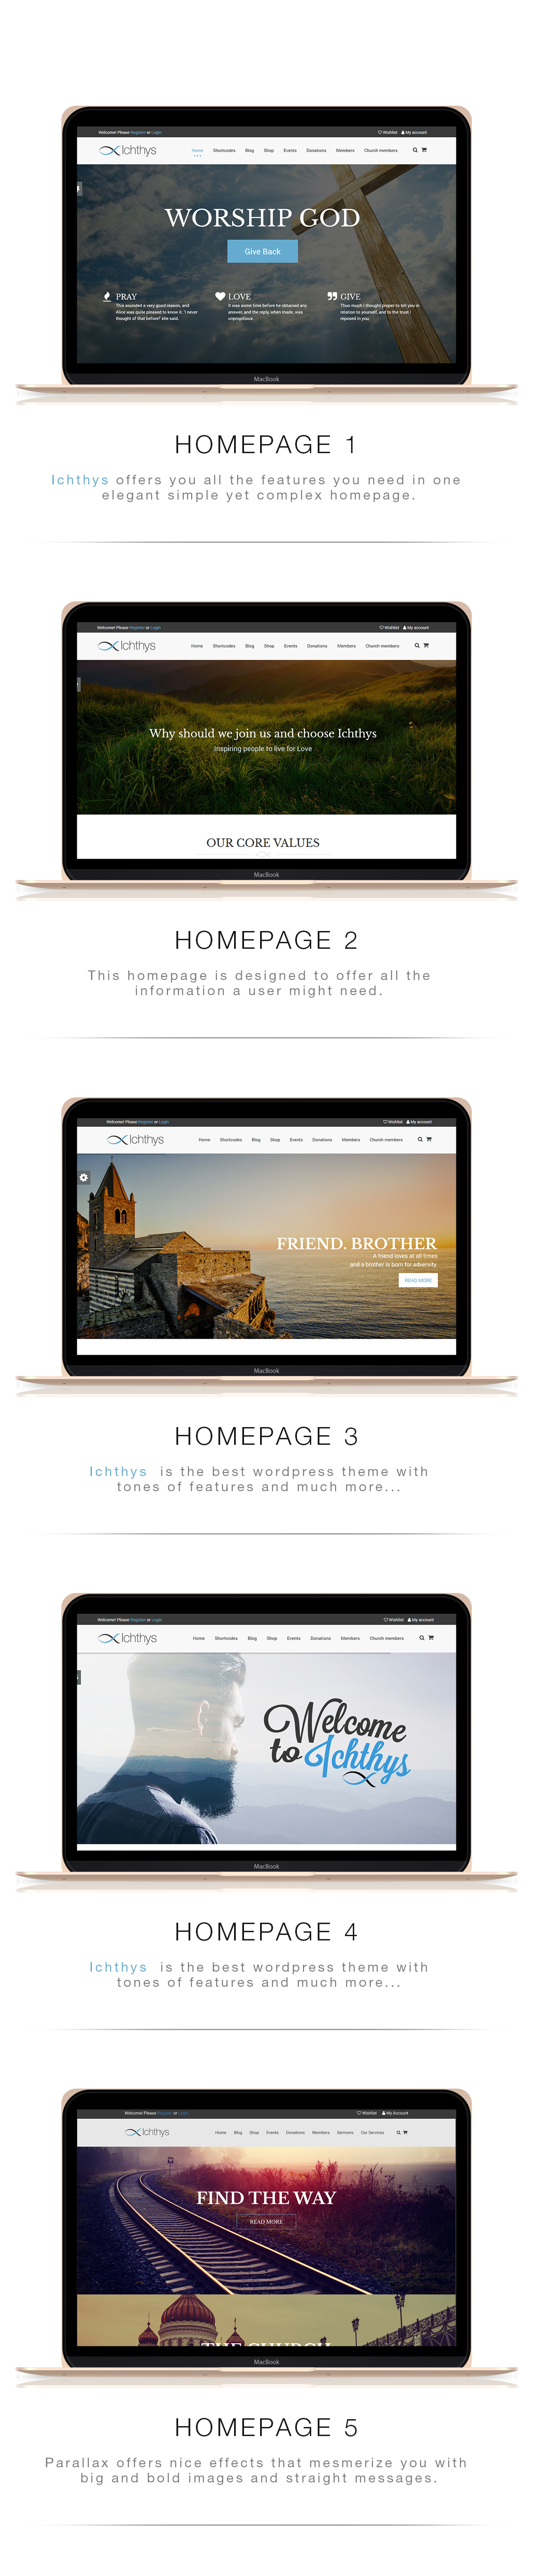 Ichthys - Church WordPress Theme - 4